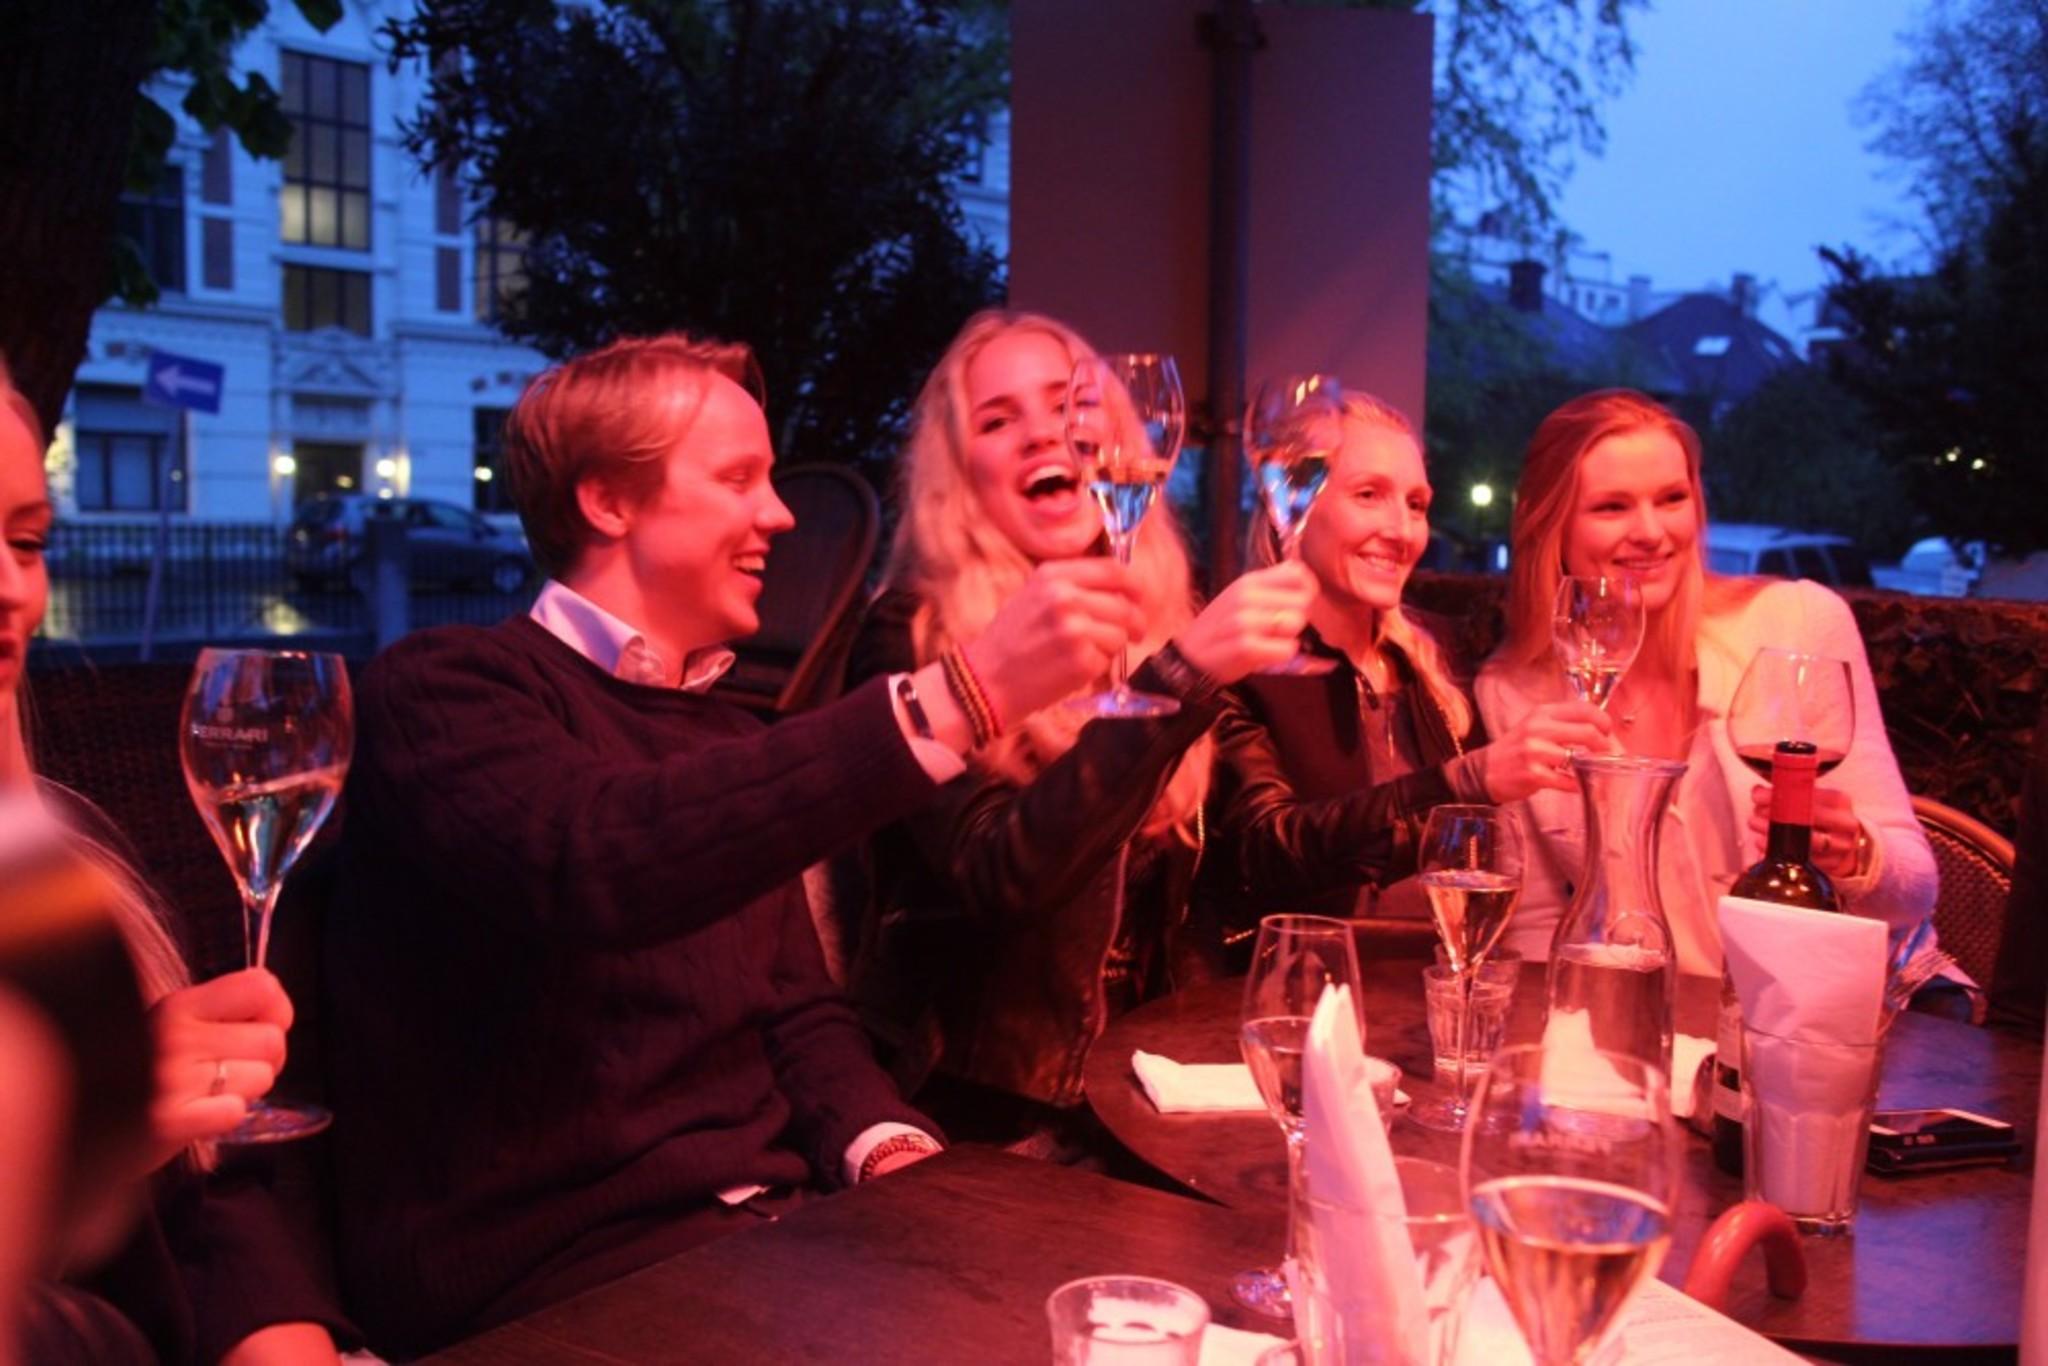 Dinner Time at Olivia Hegdehaugsveien Restaurant after our